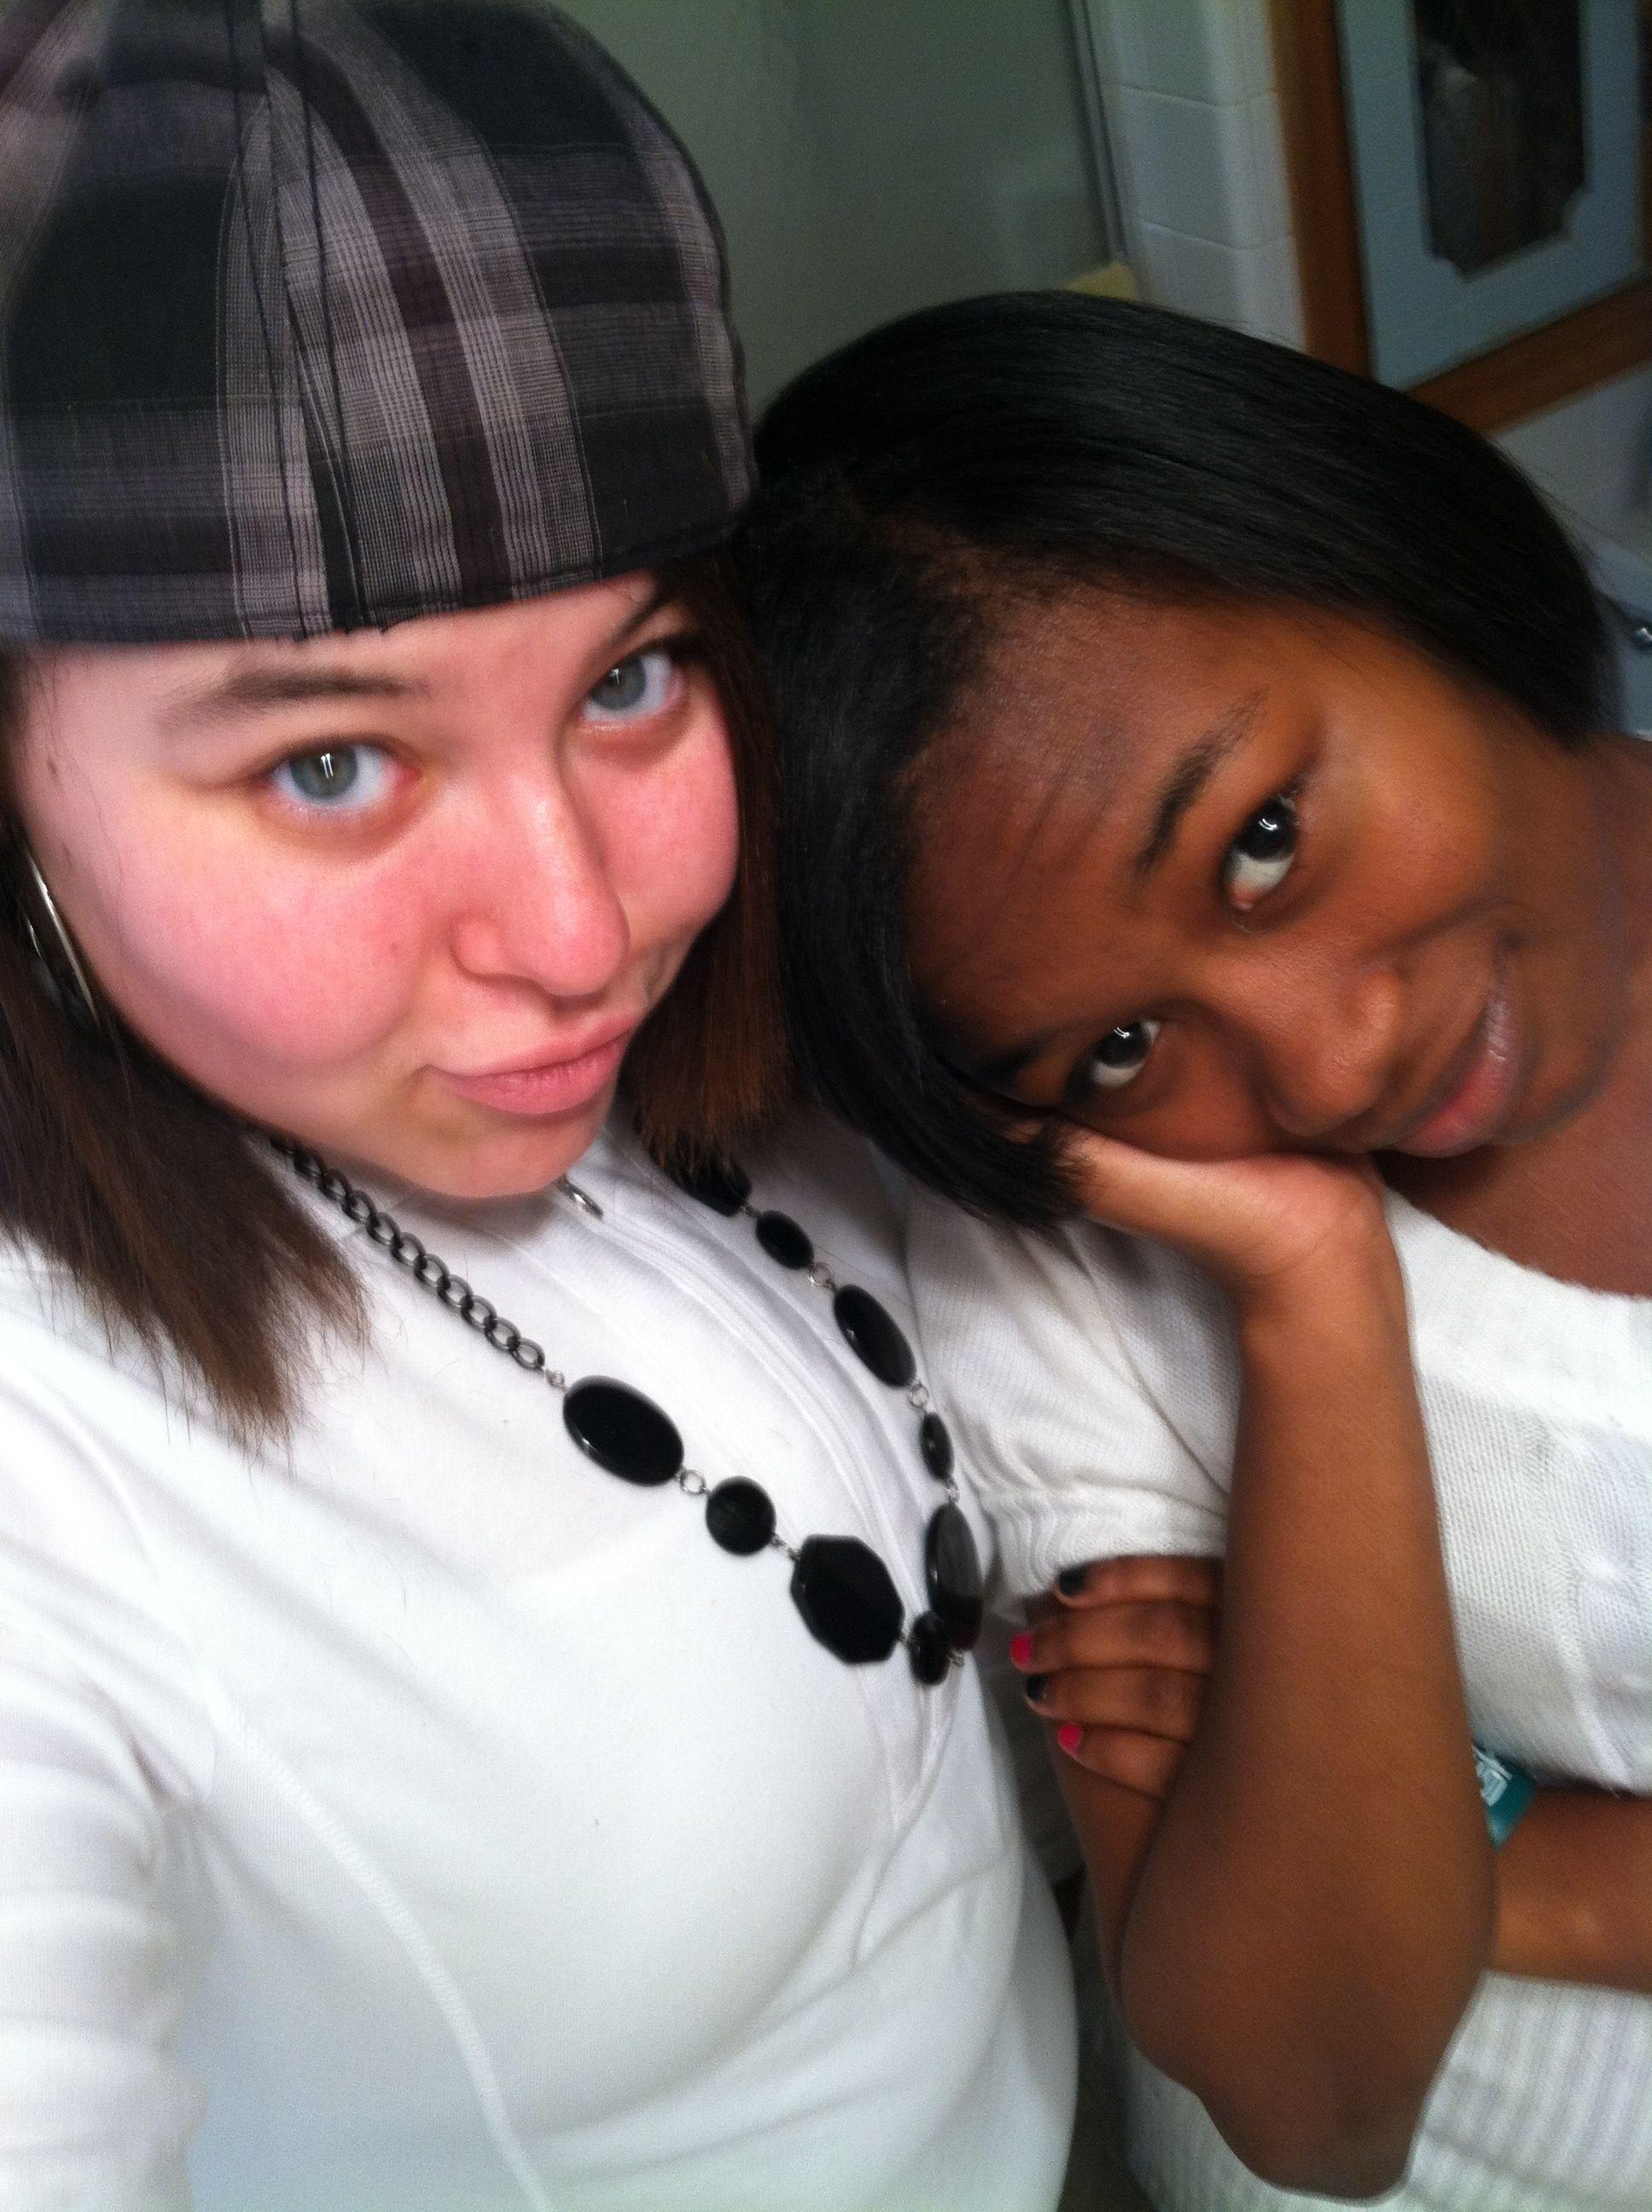 Sometimes I feel closer than a friend I feel more like a sister